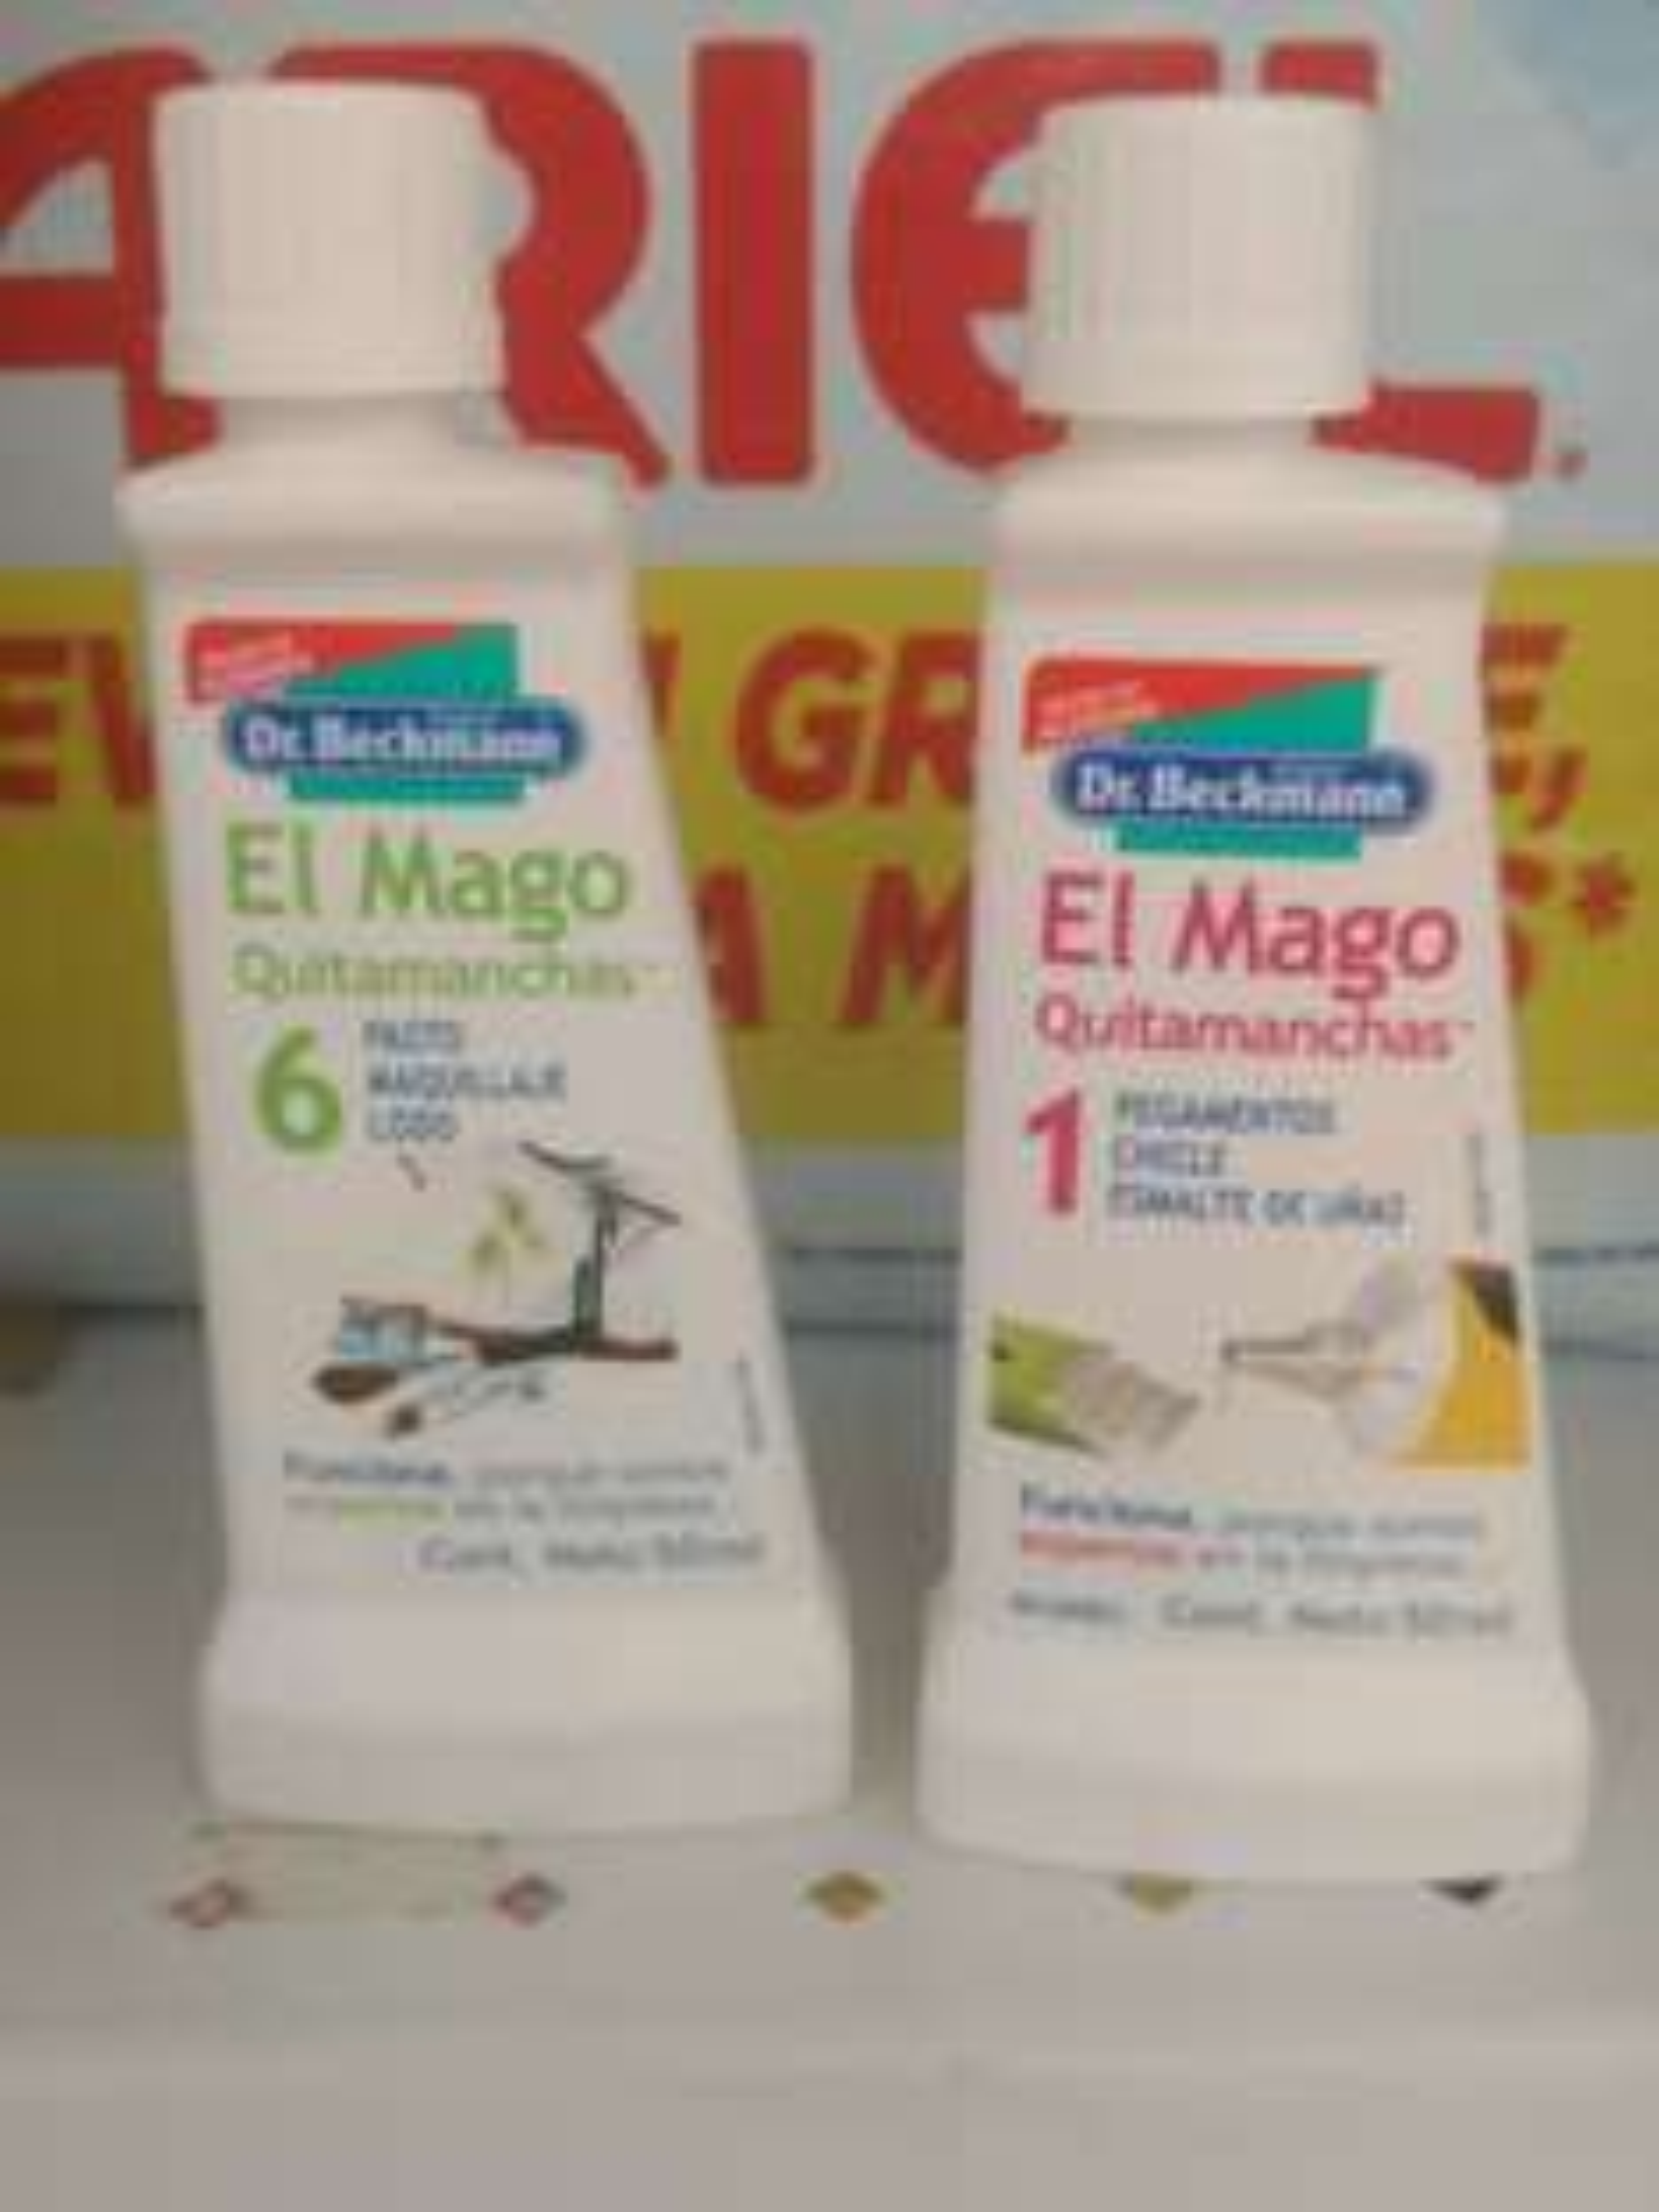 Chedraui: Desmanchador dr. Beckmann a $4.15